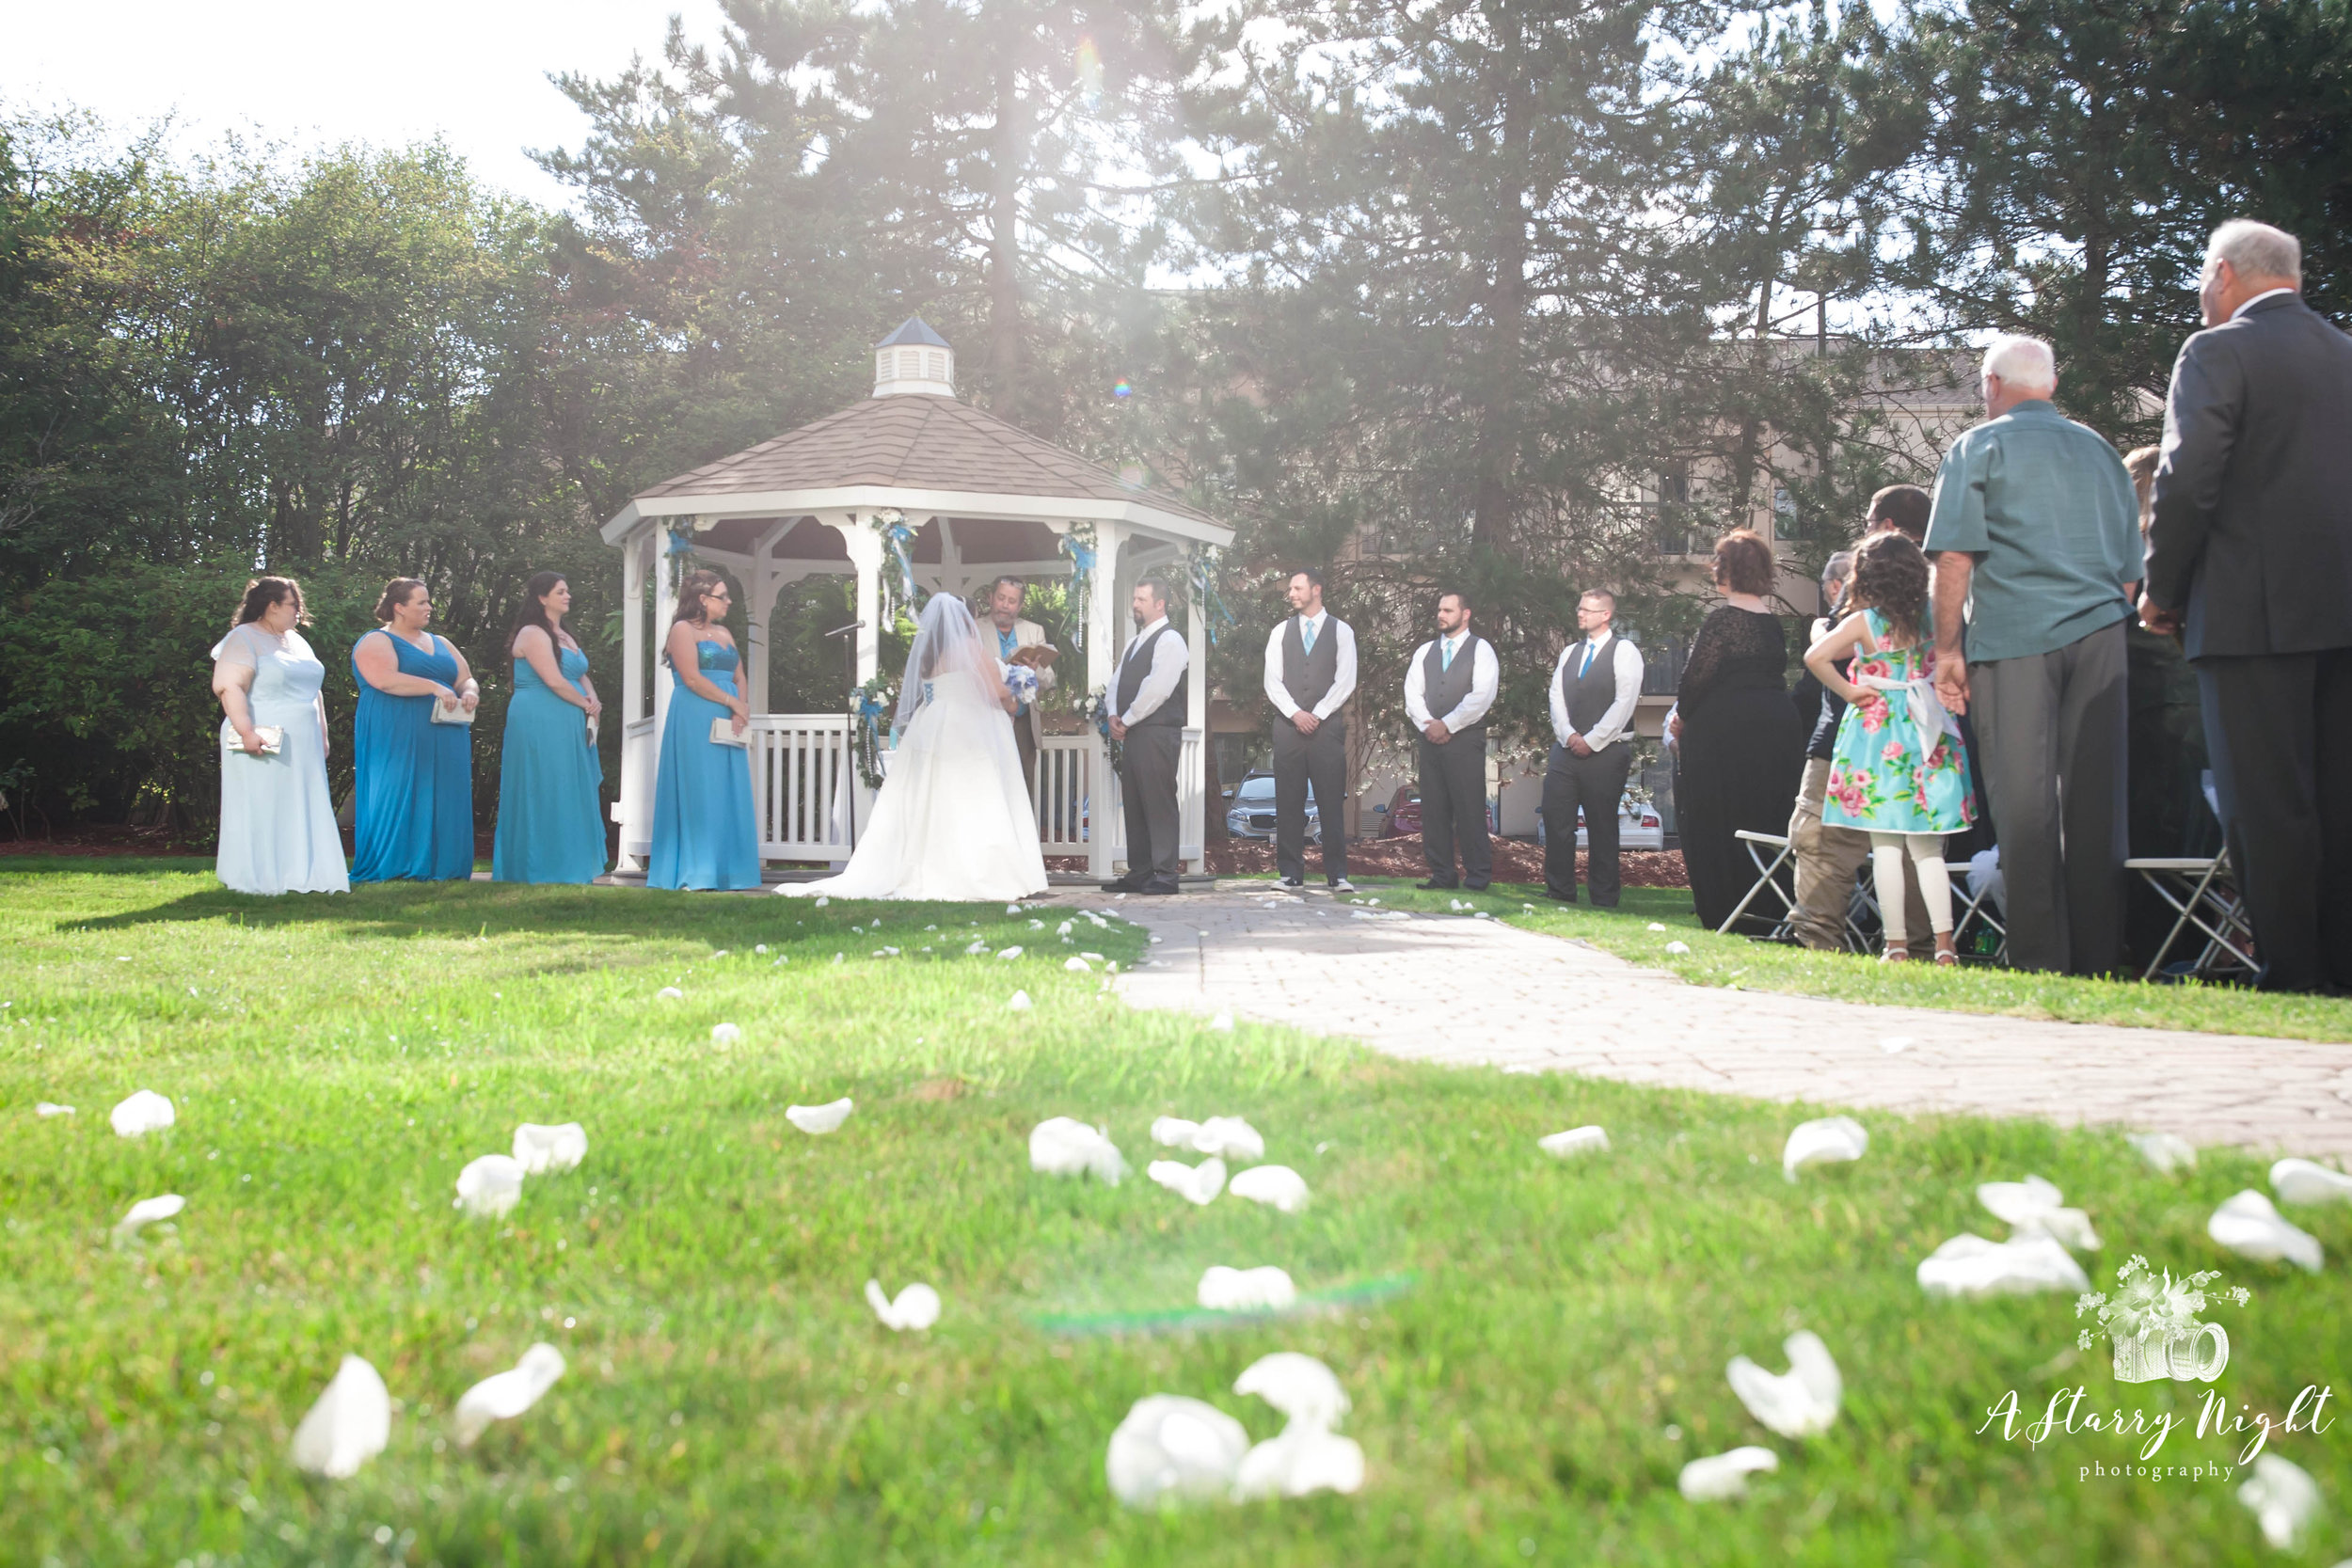 Courtyard-detroit-wedding-ceremony-outdoor-guests.jpg